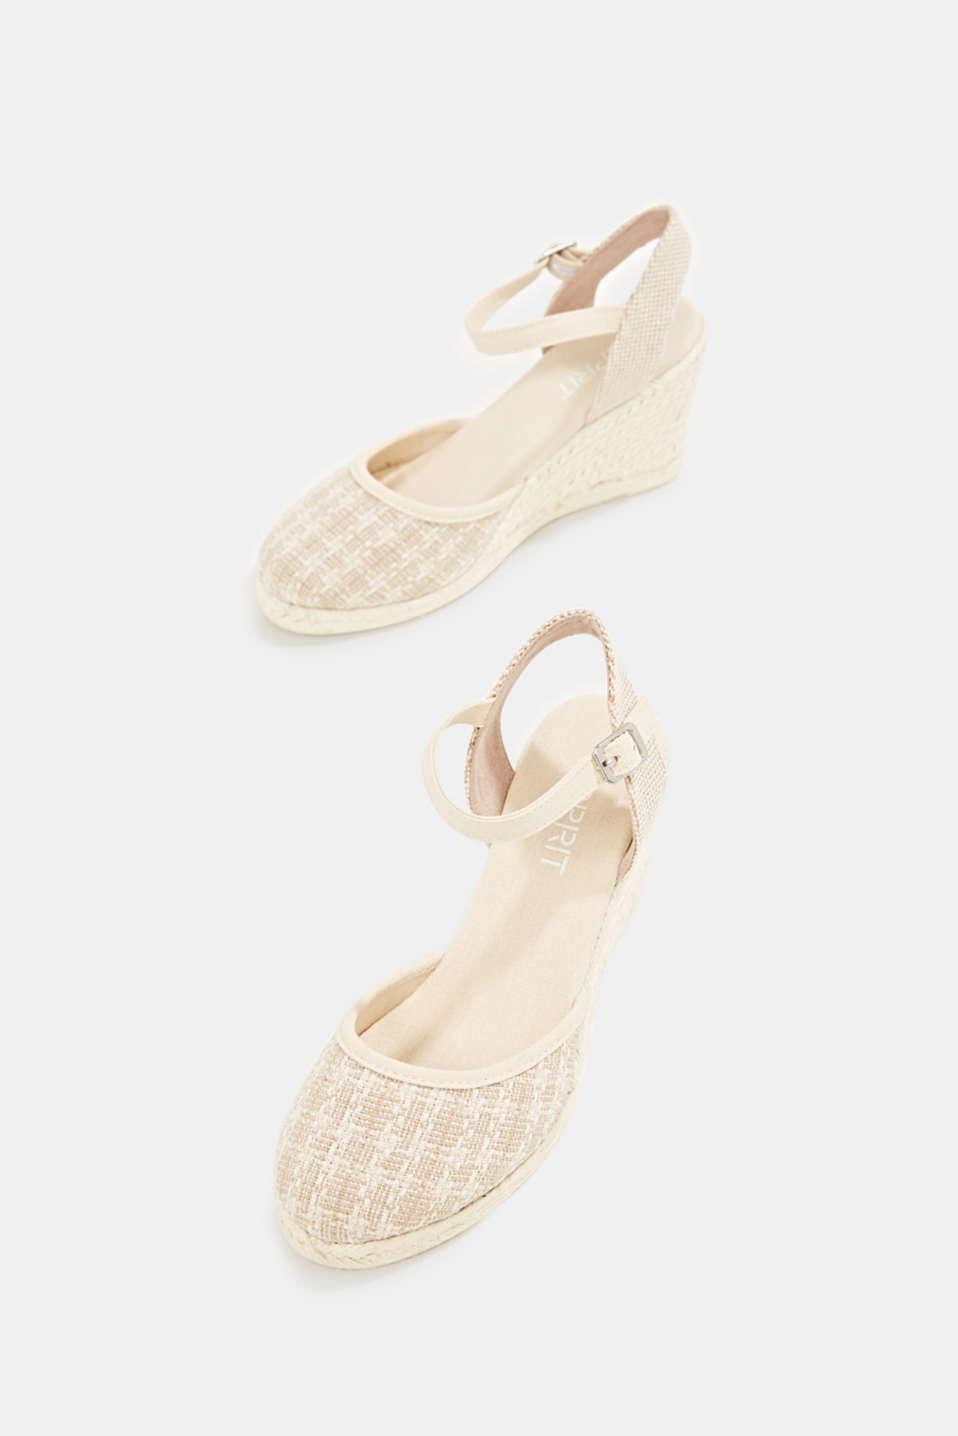 Espadrille sandals with a wedge heel, BEIGE, detail image number 1